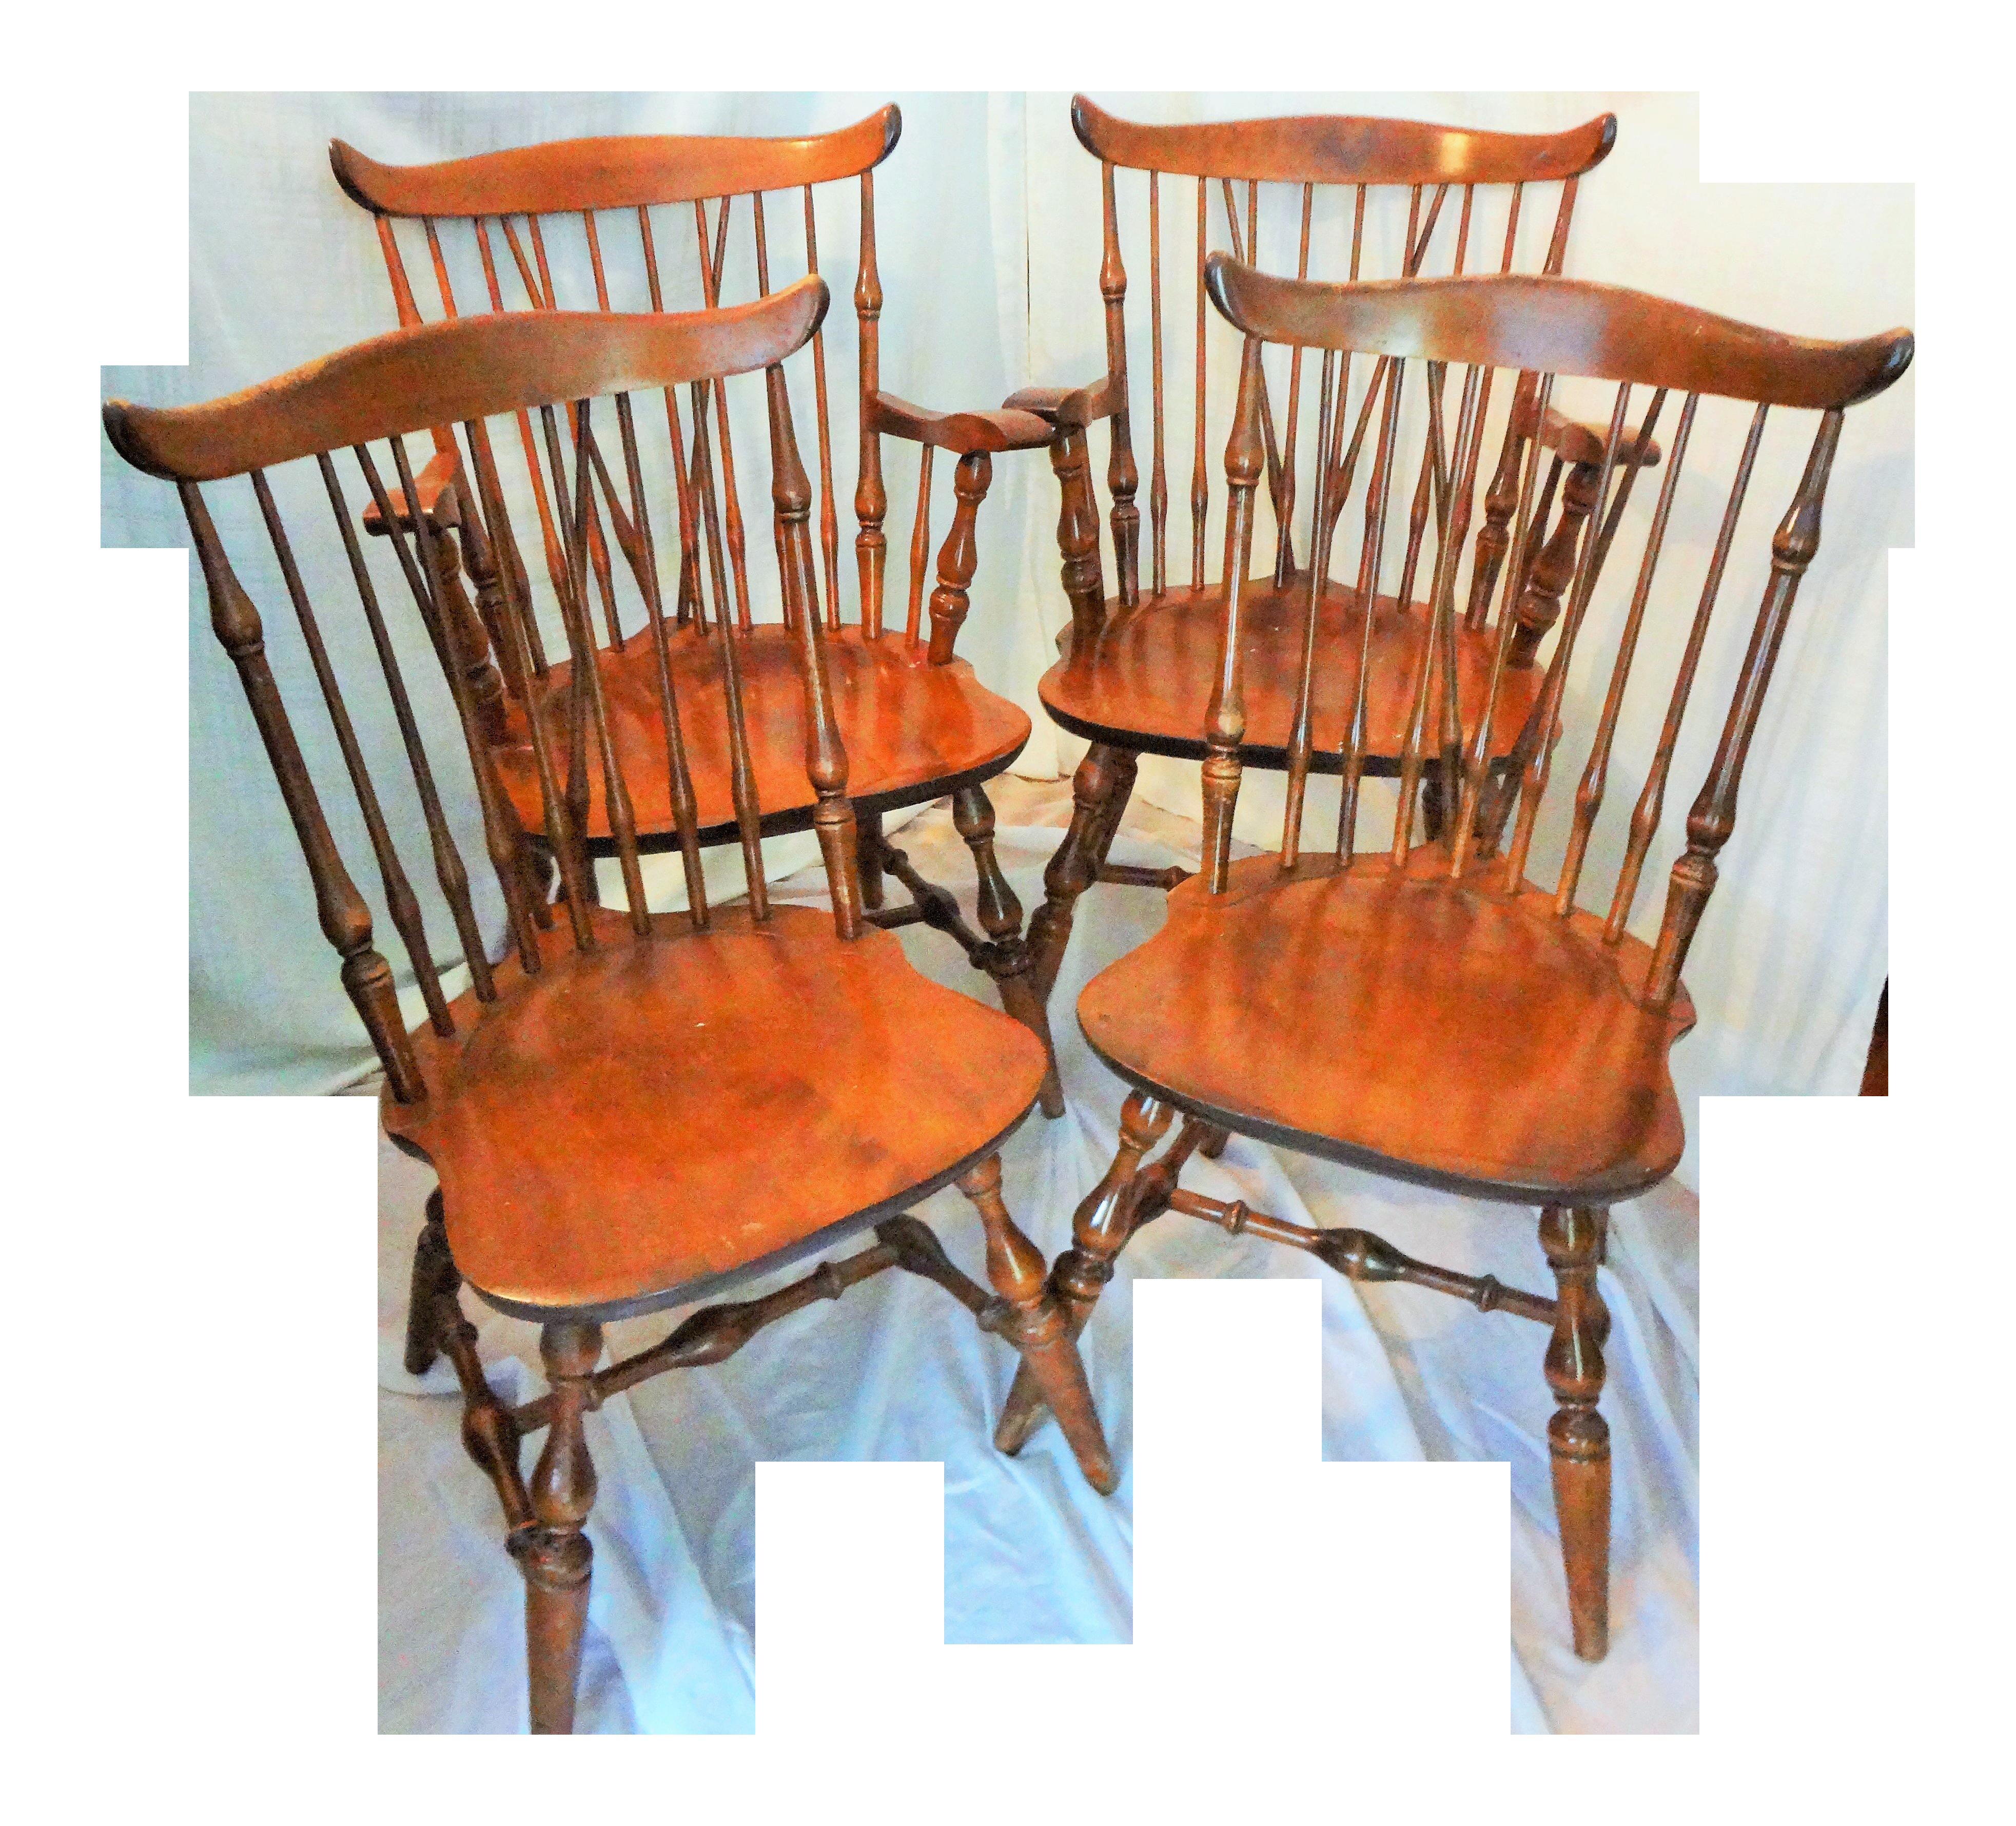 Mid Century Nichols U0026 Stone Fan Back Chairs   Set Of 4 For Sale